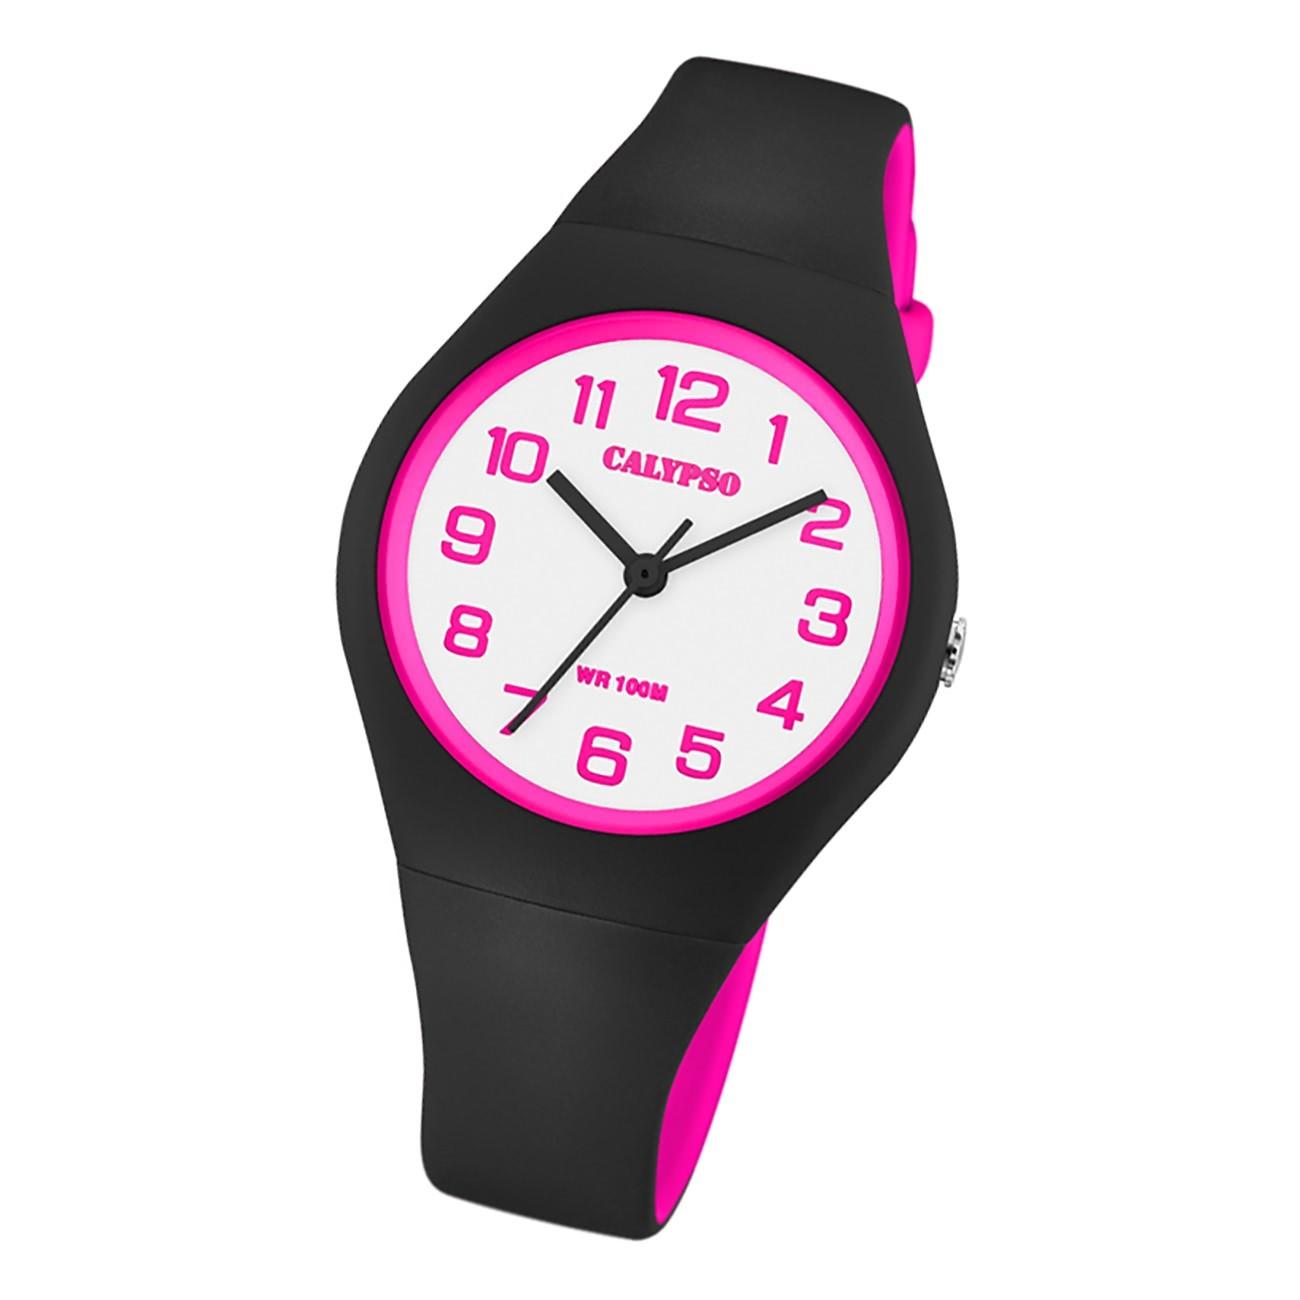 Calypso Damen Jugend Armbanduhr K5777/8 Analog Kunststoff schwarz UK5777/8